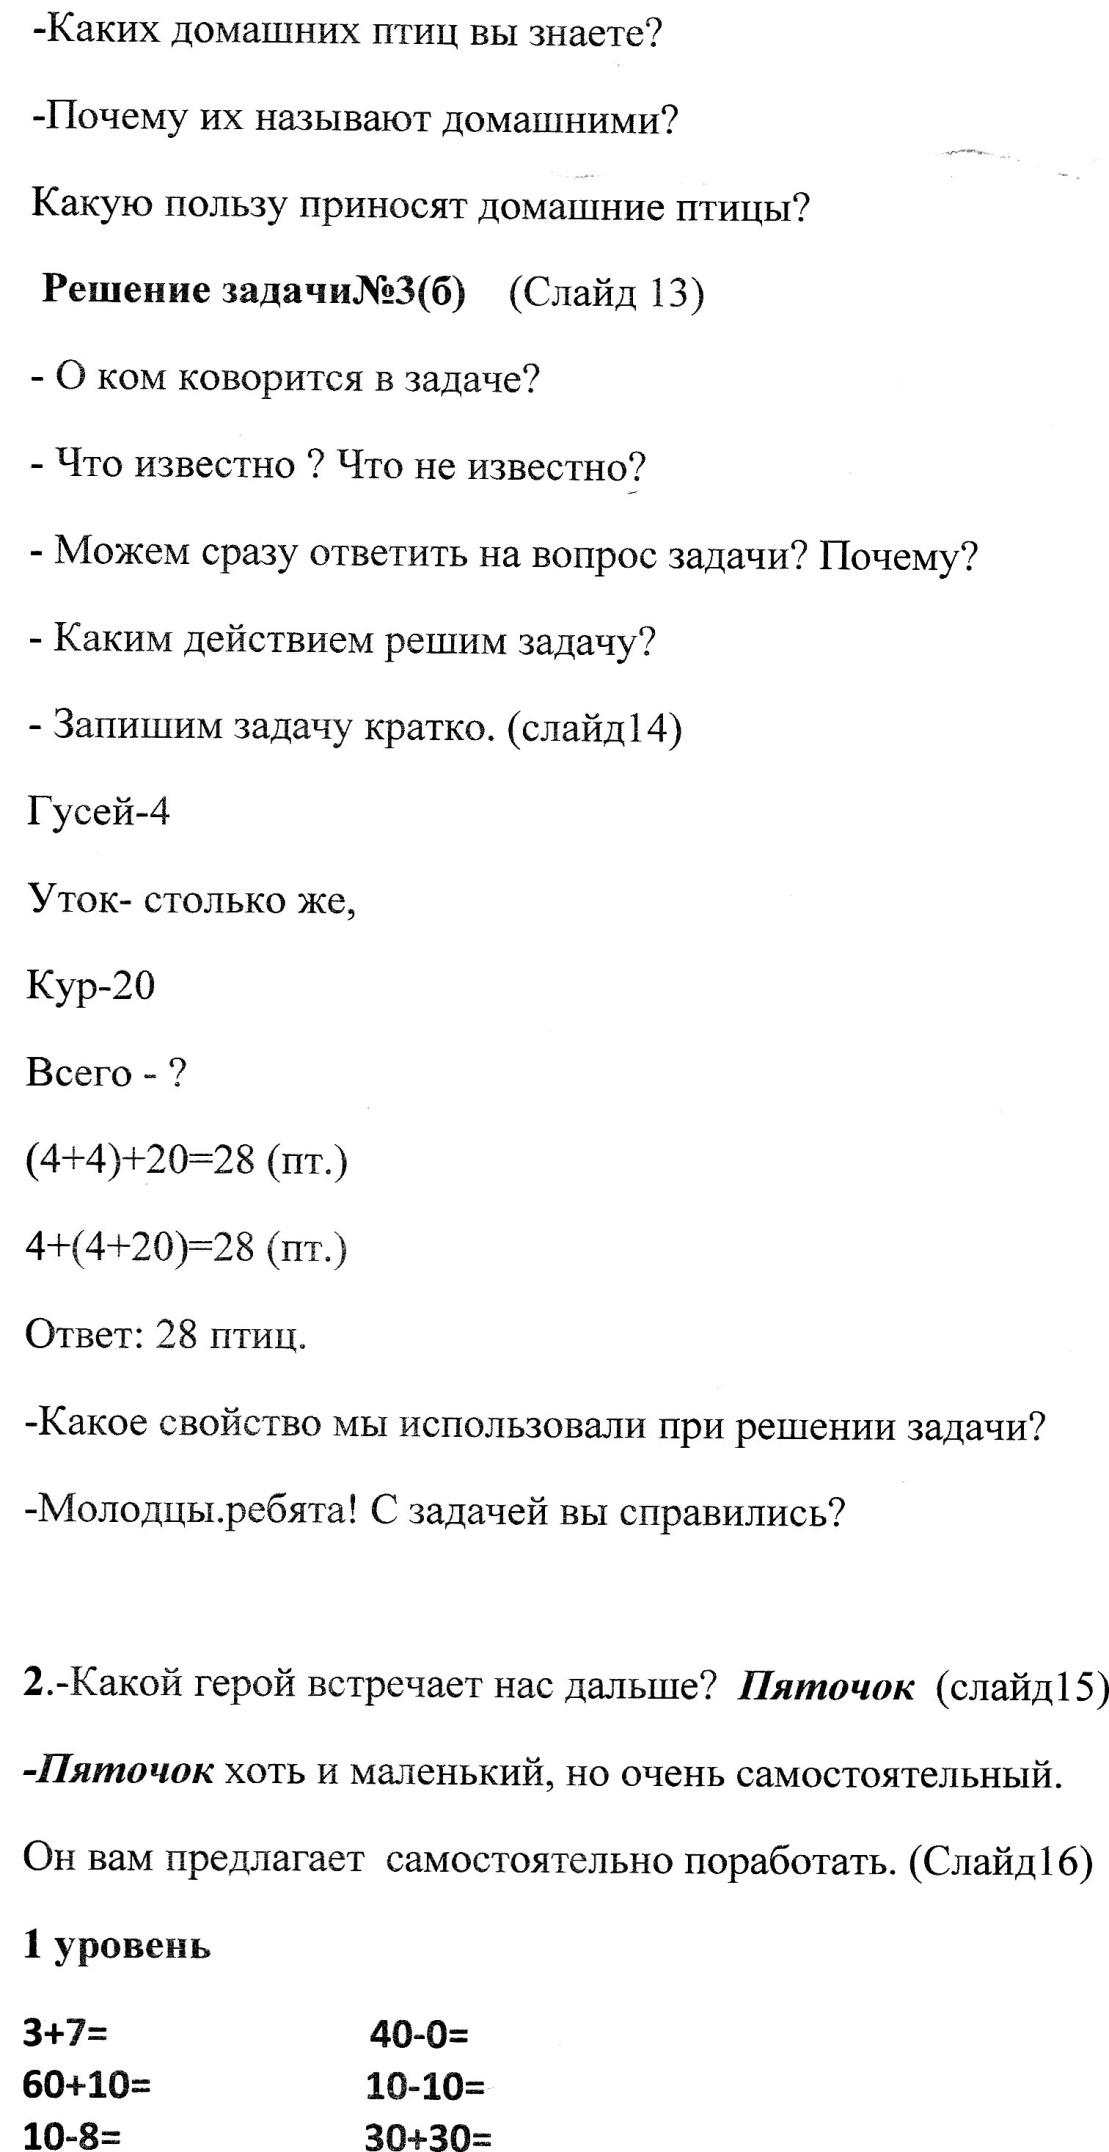 C:\Users\Жирафчик\AppData\Local\Microsoft\Windows\Temporary Internet Files\Content.Word\img066.jpg